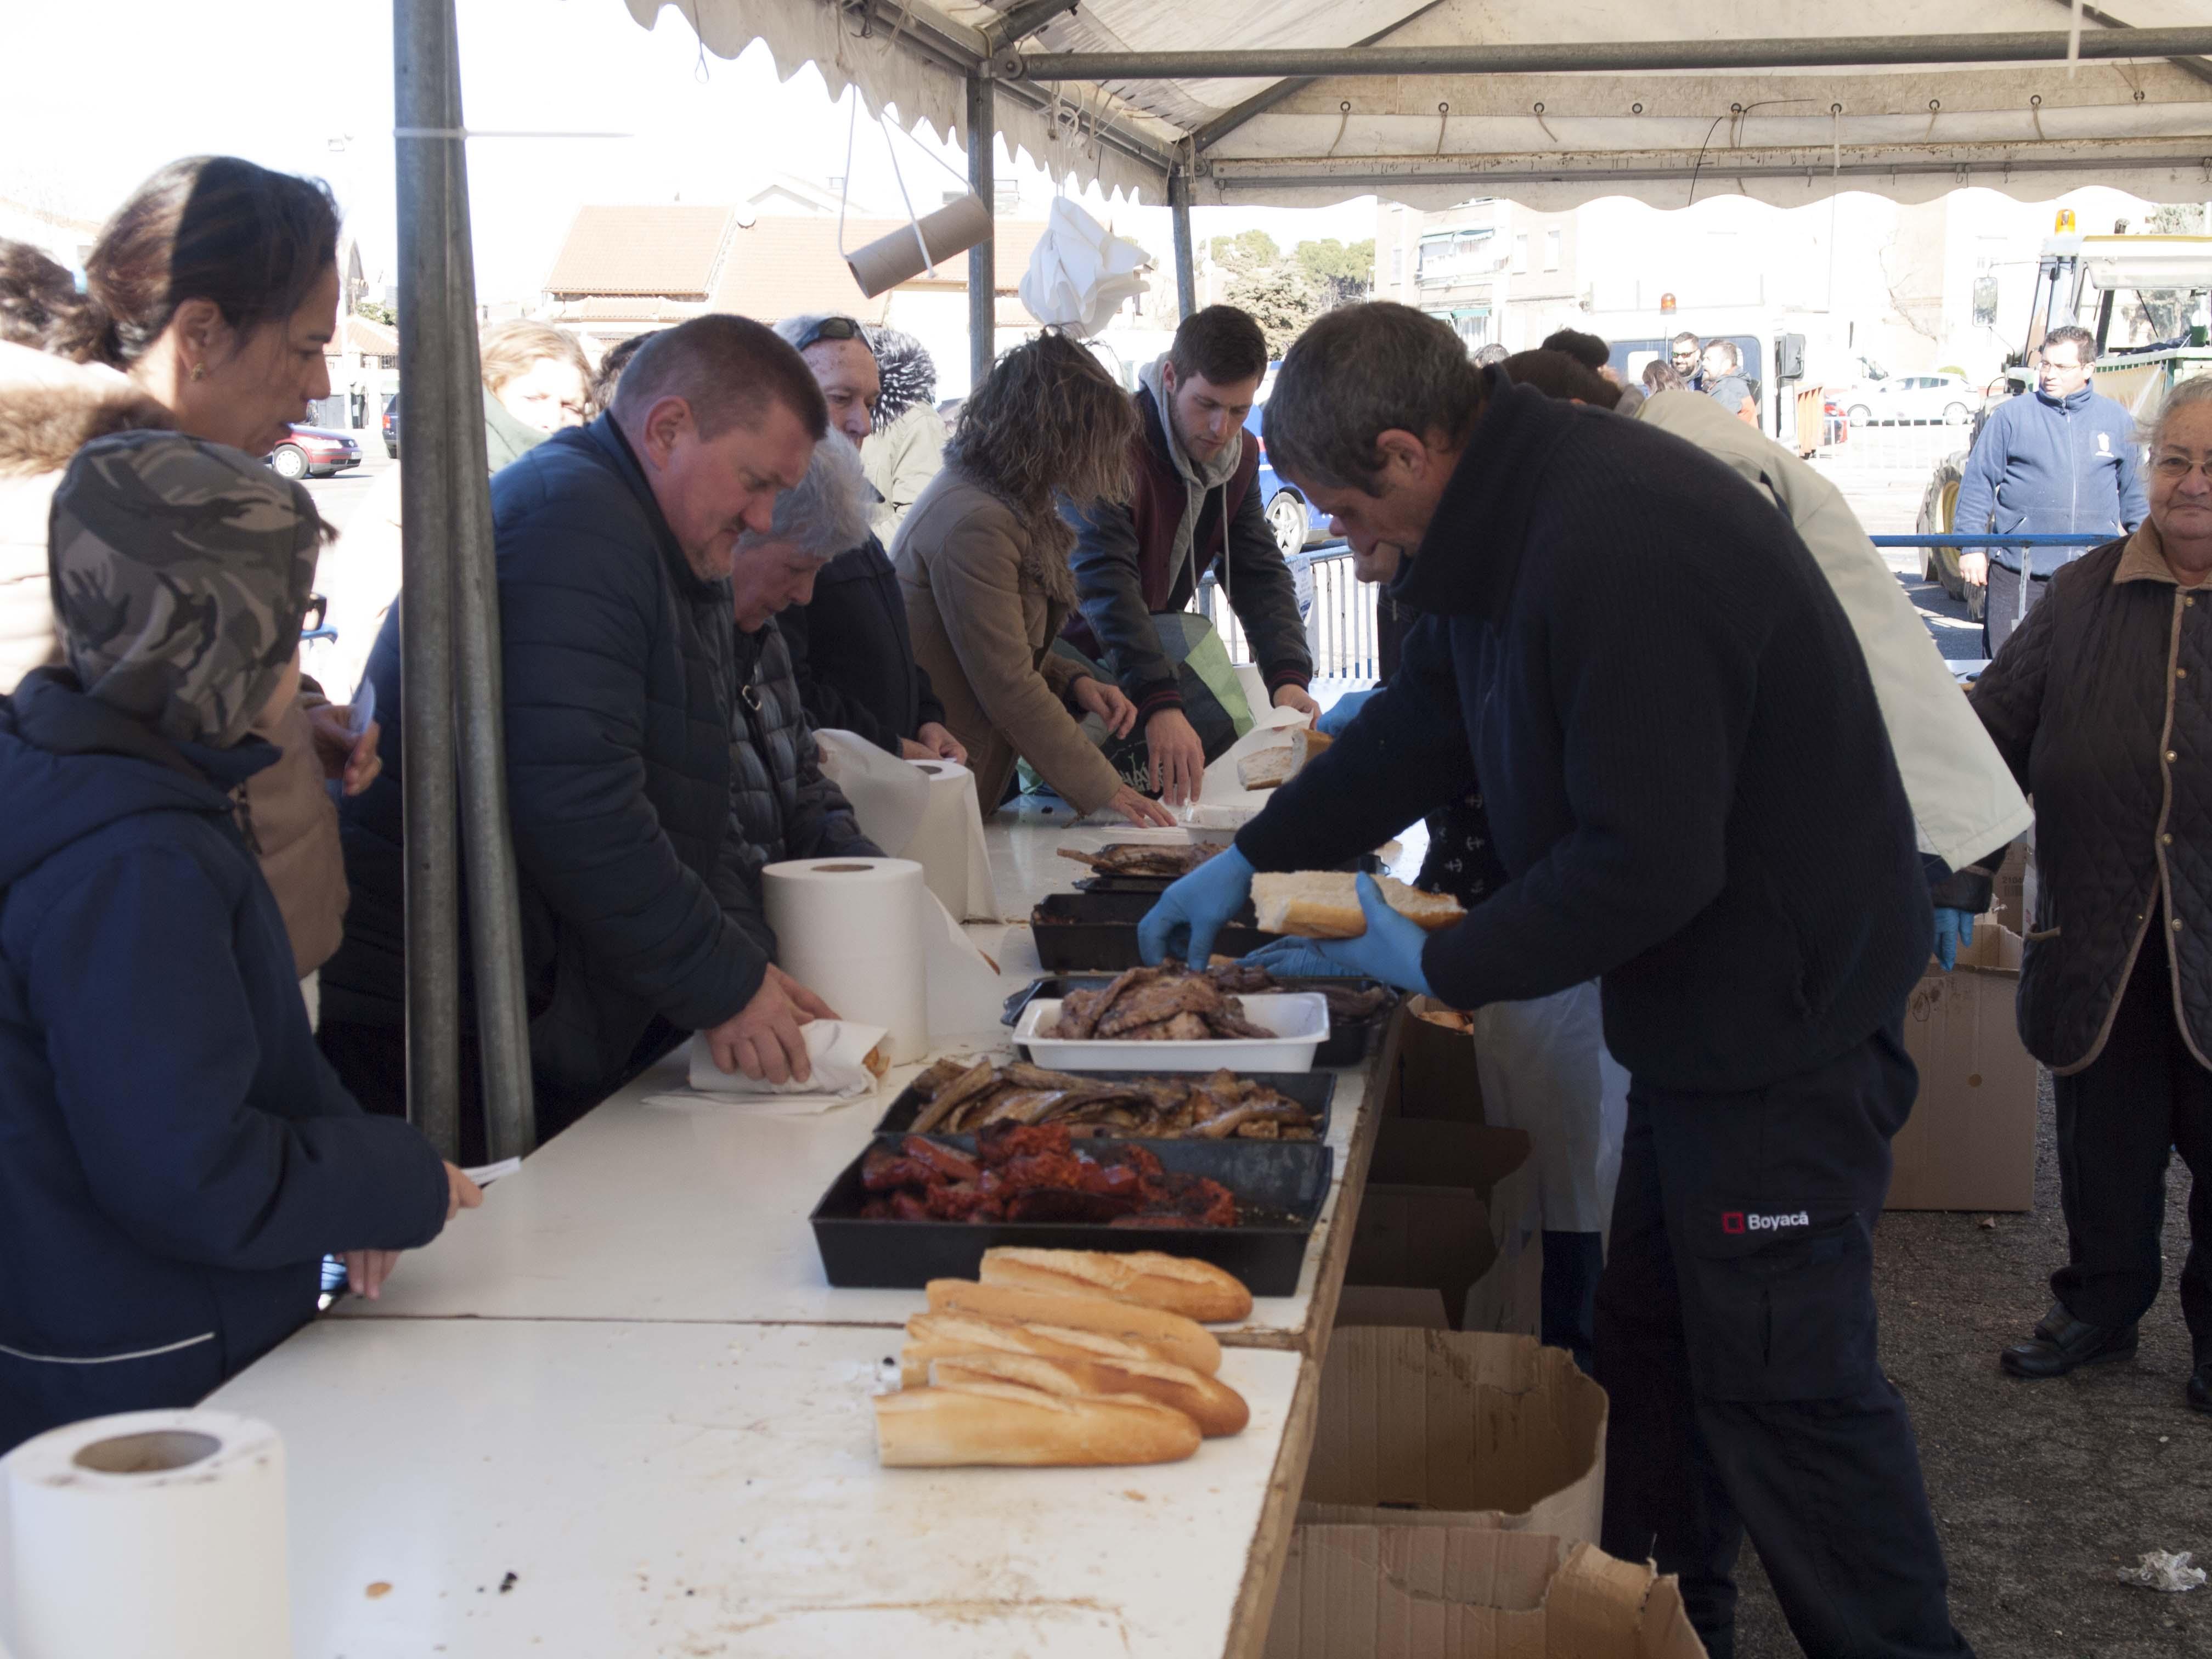 Velilla celebró ayer la Fiesta de la Pitanza